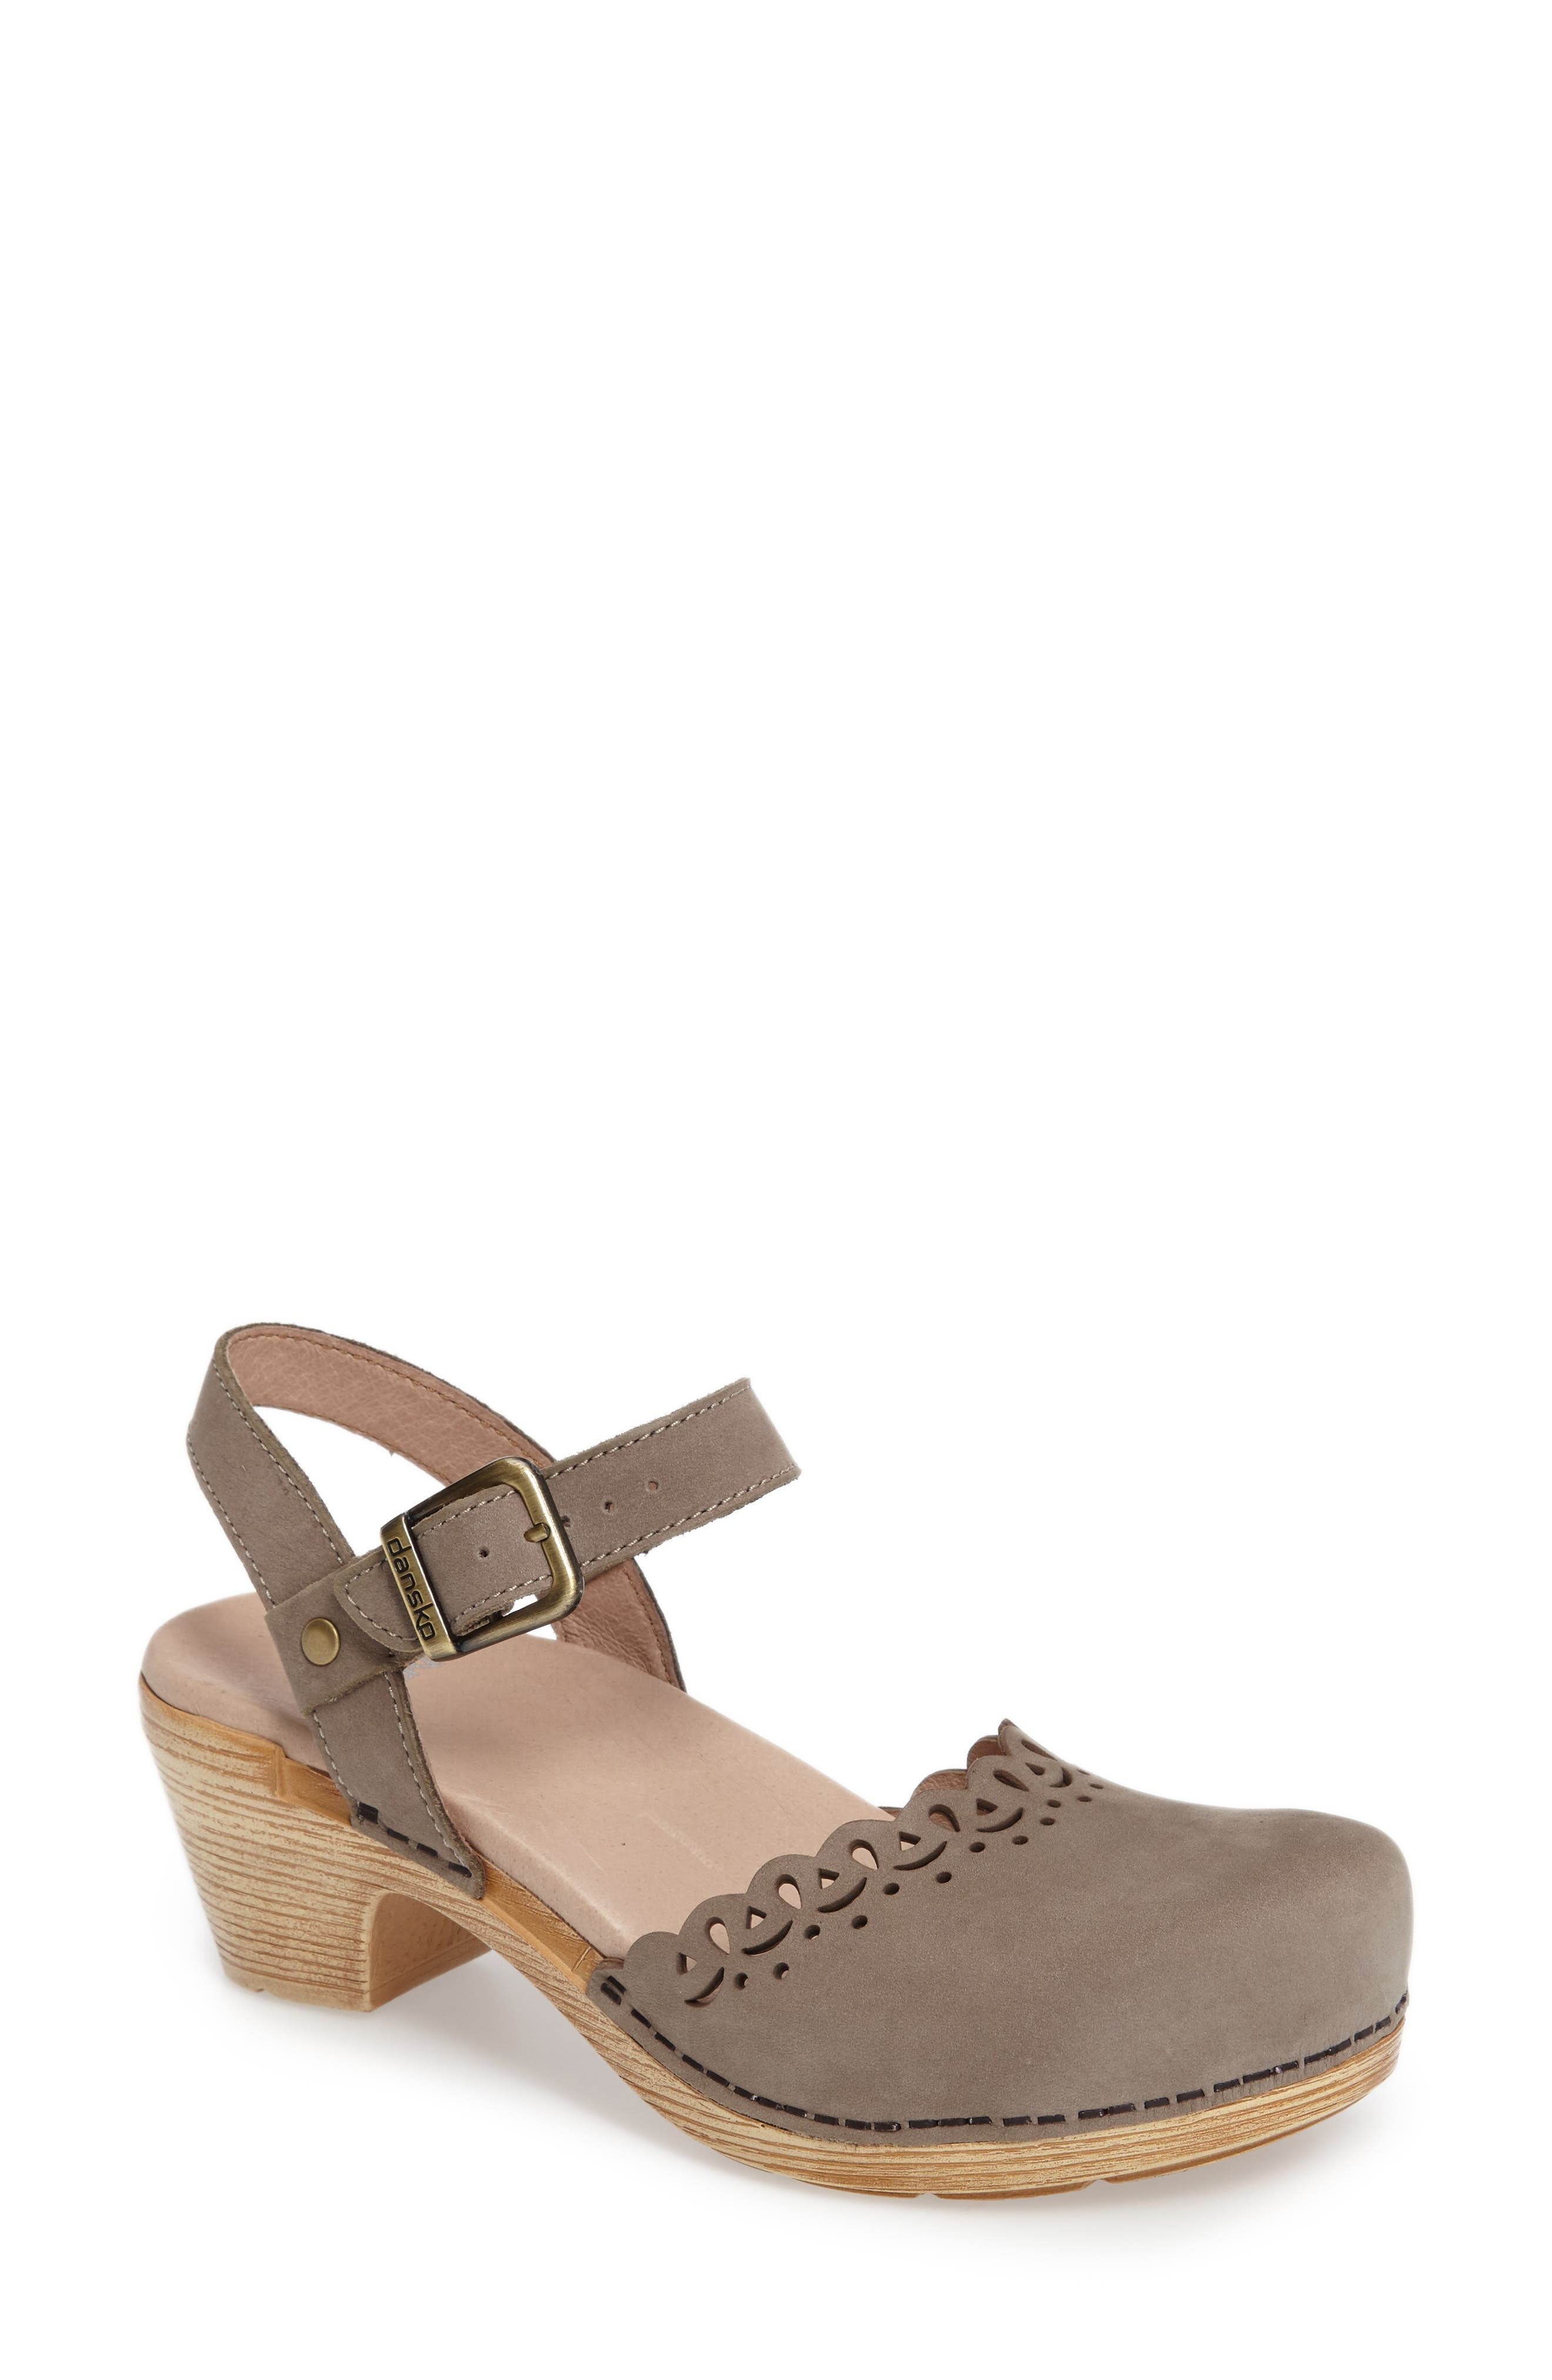 Alternate Image 1 Selected - Dansko 'Marta' Ankle Strap Clog (Women)